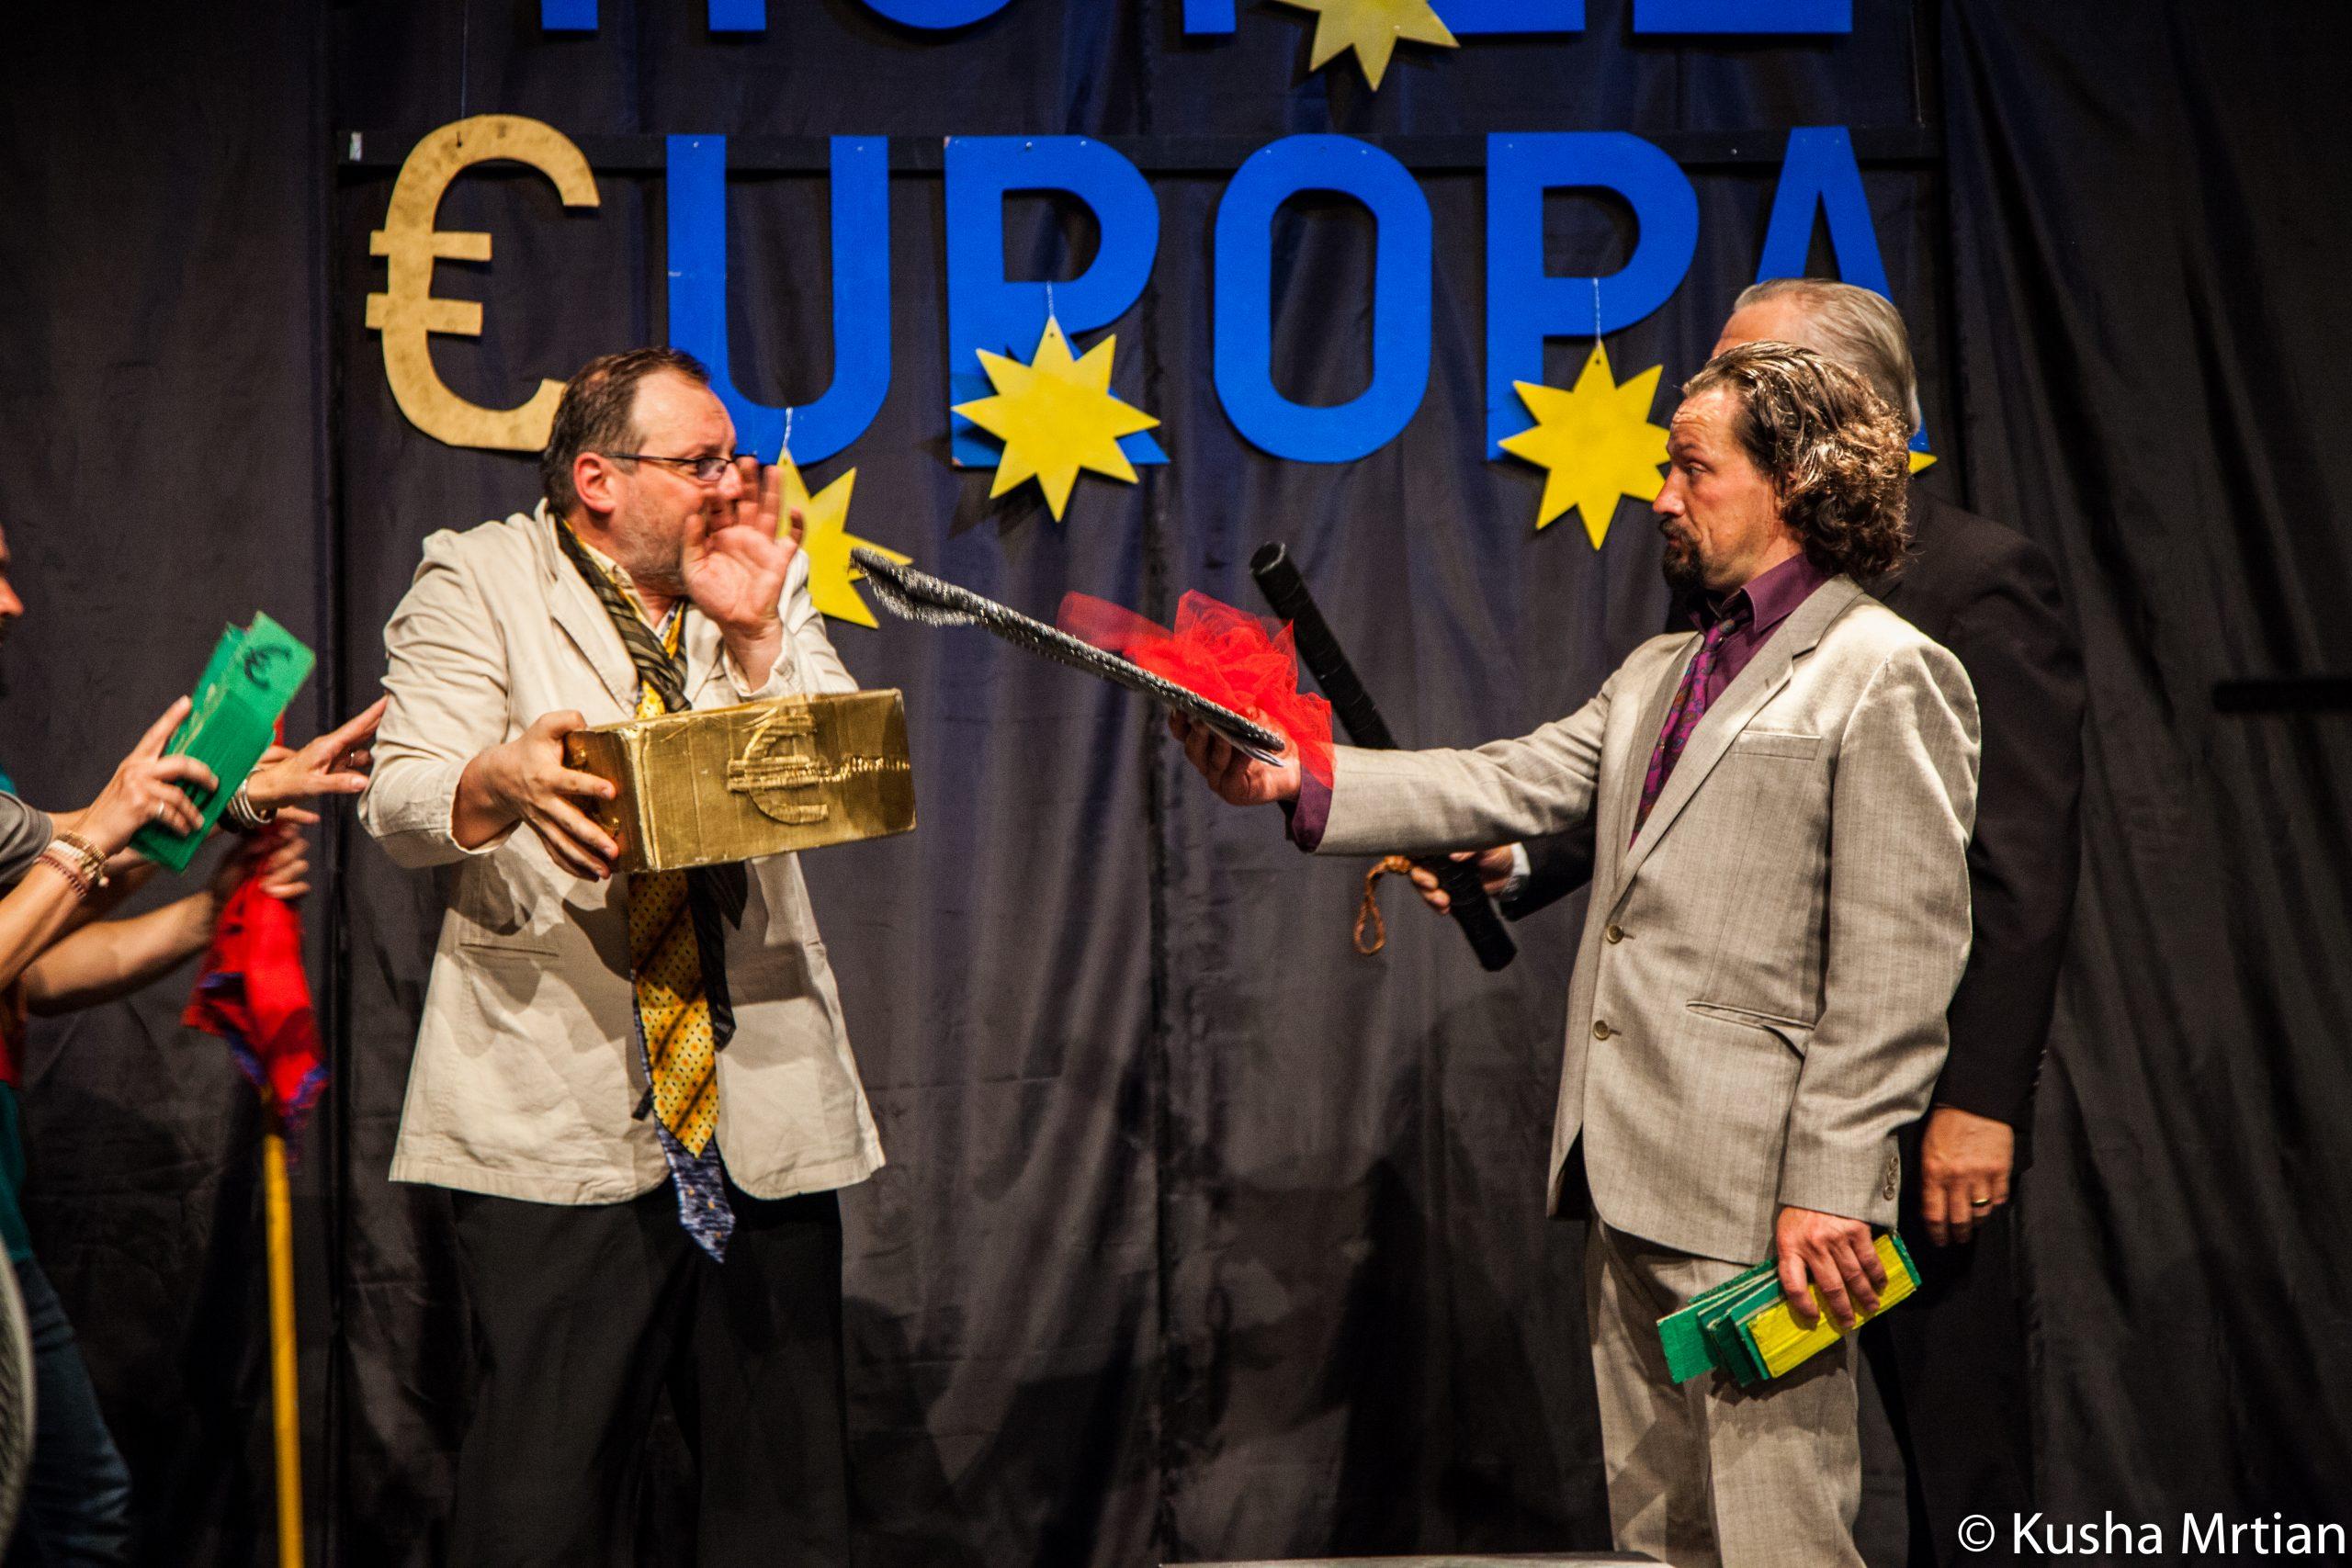 HotelEuropa2015-4